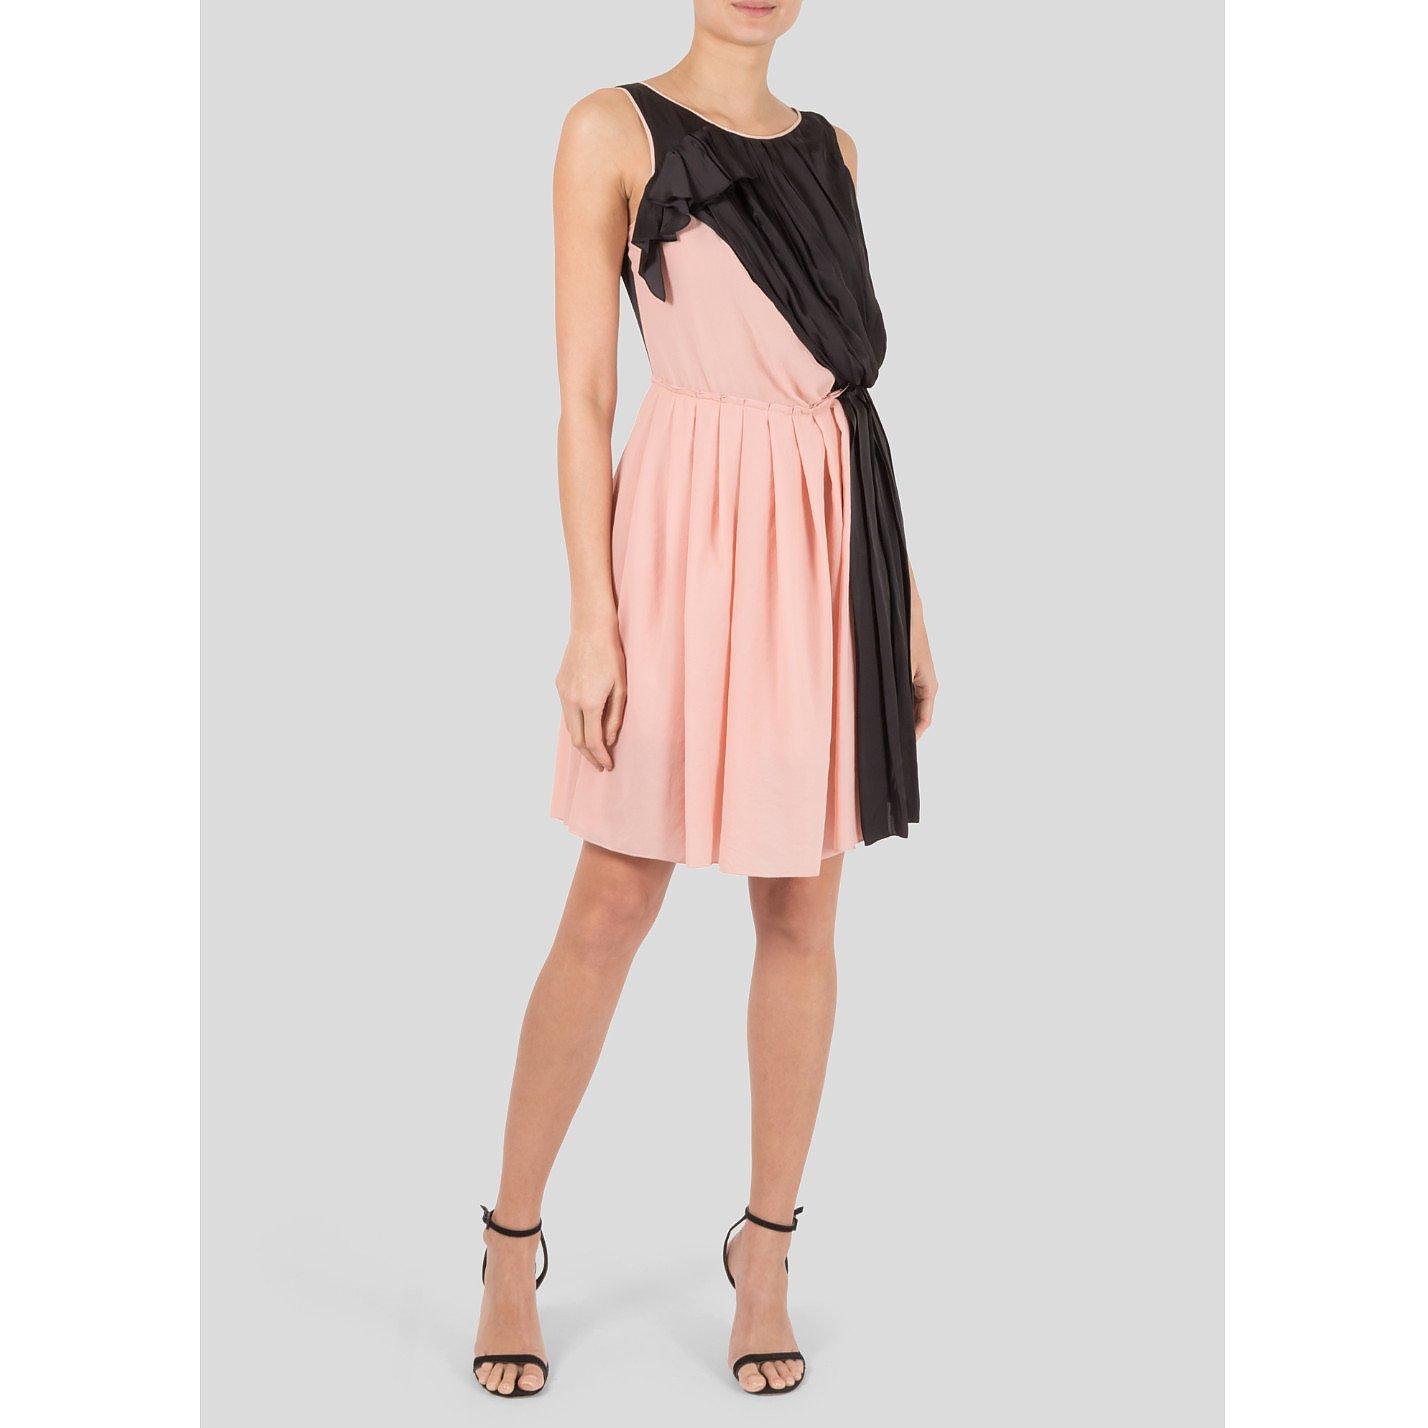 Nina Ricci Two-Tone Draped Dress